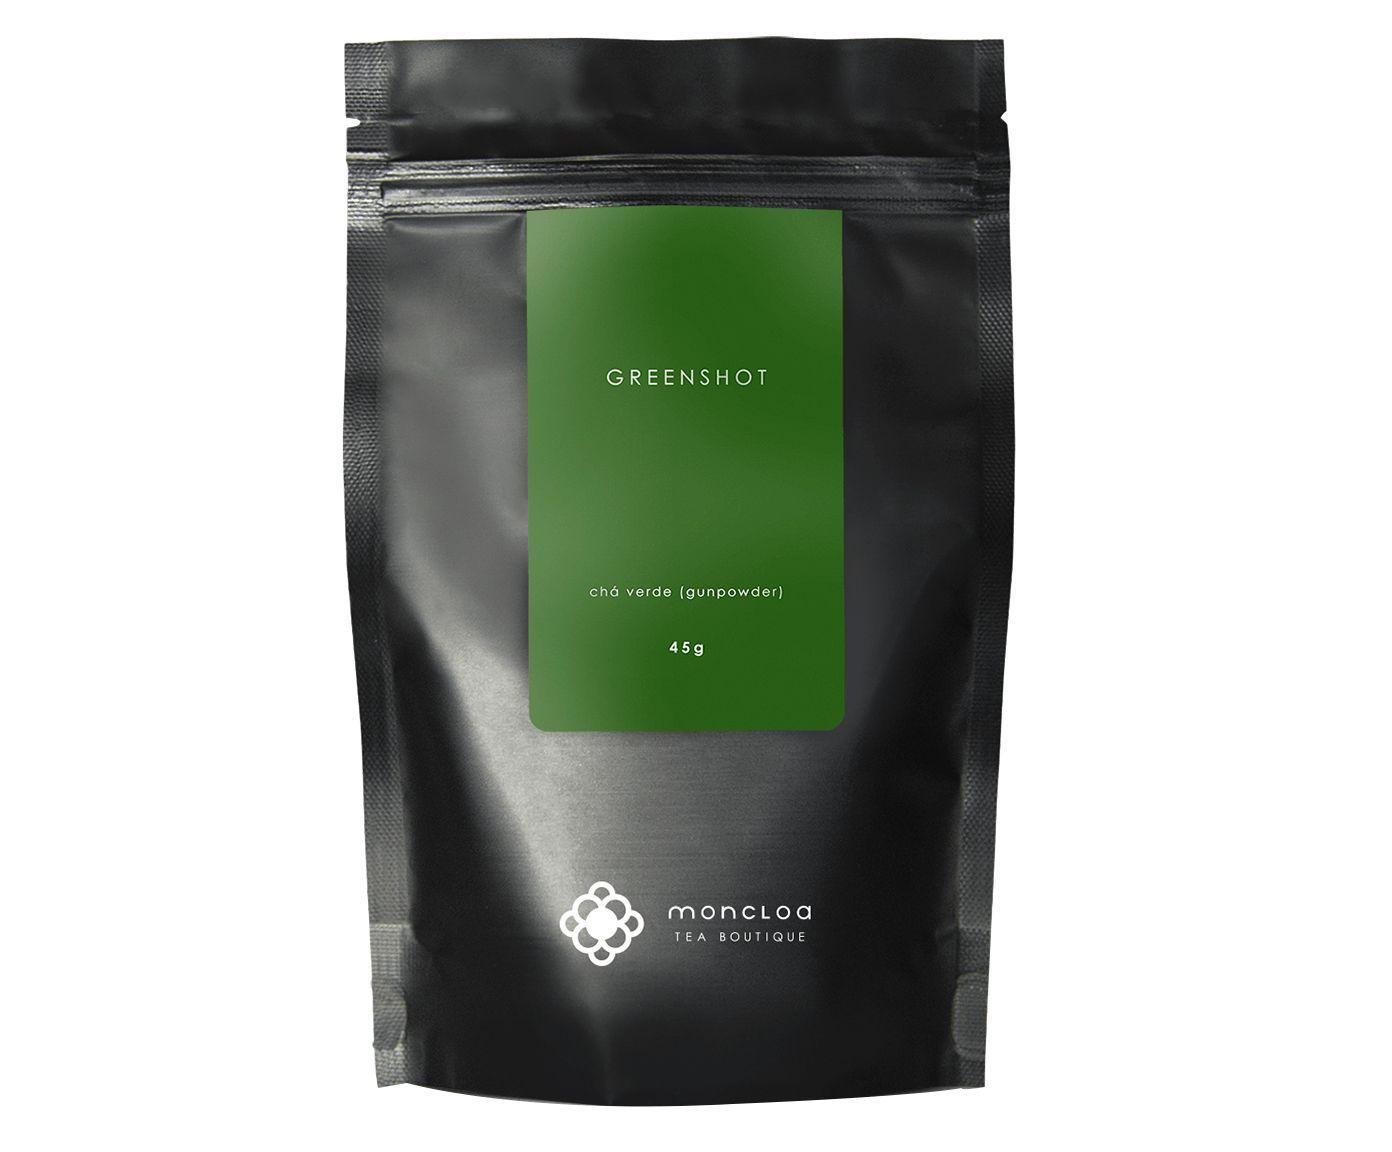 Chá Greenshot Pouch - 45G | Westwing.com.br